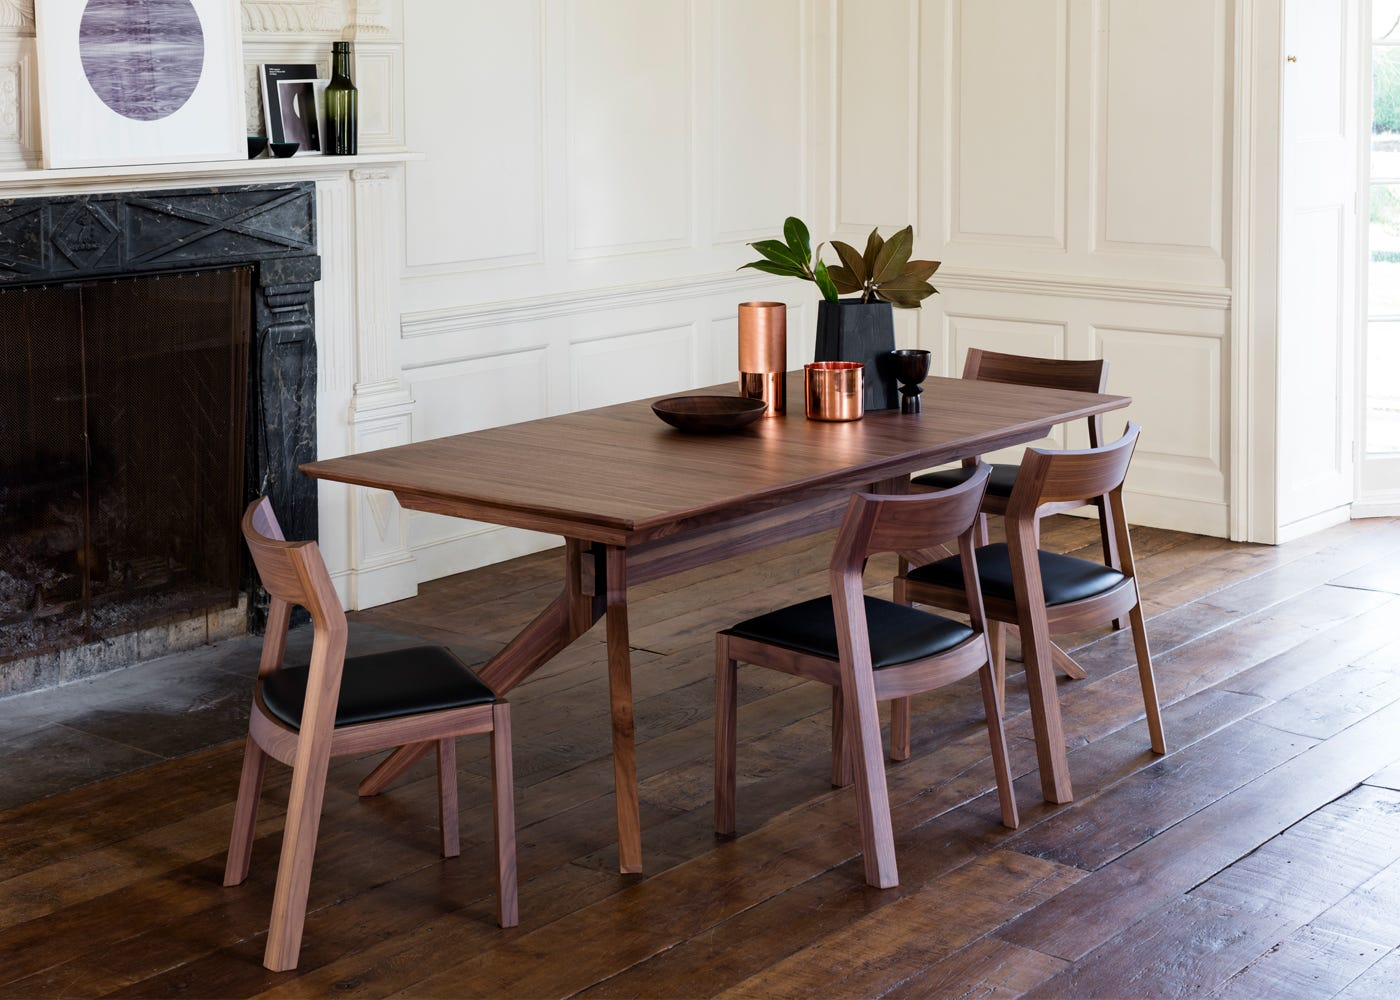 Case Cross Extending Dining Table